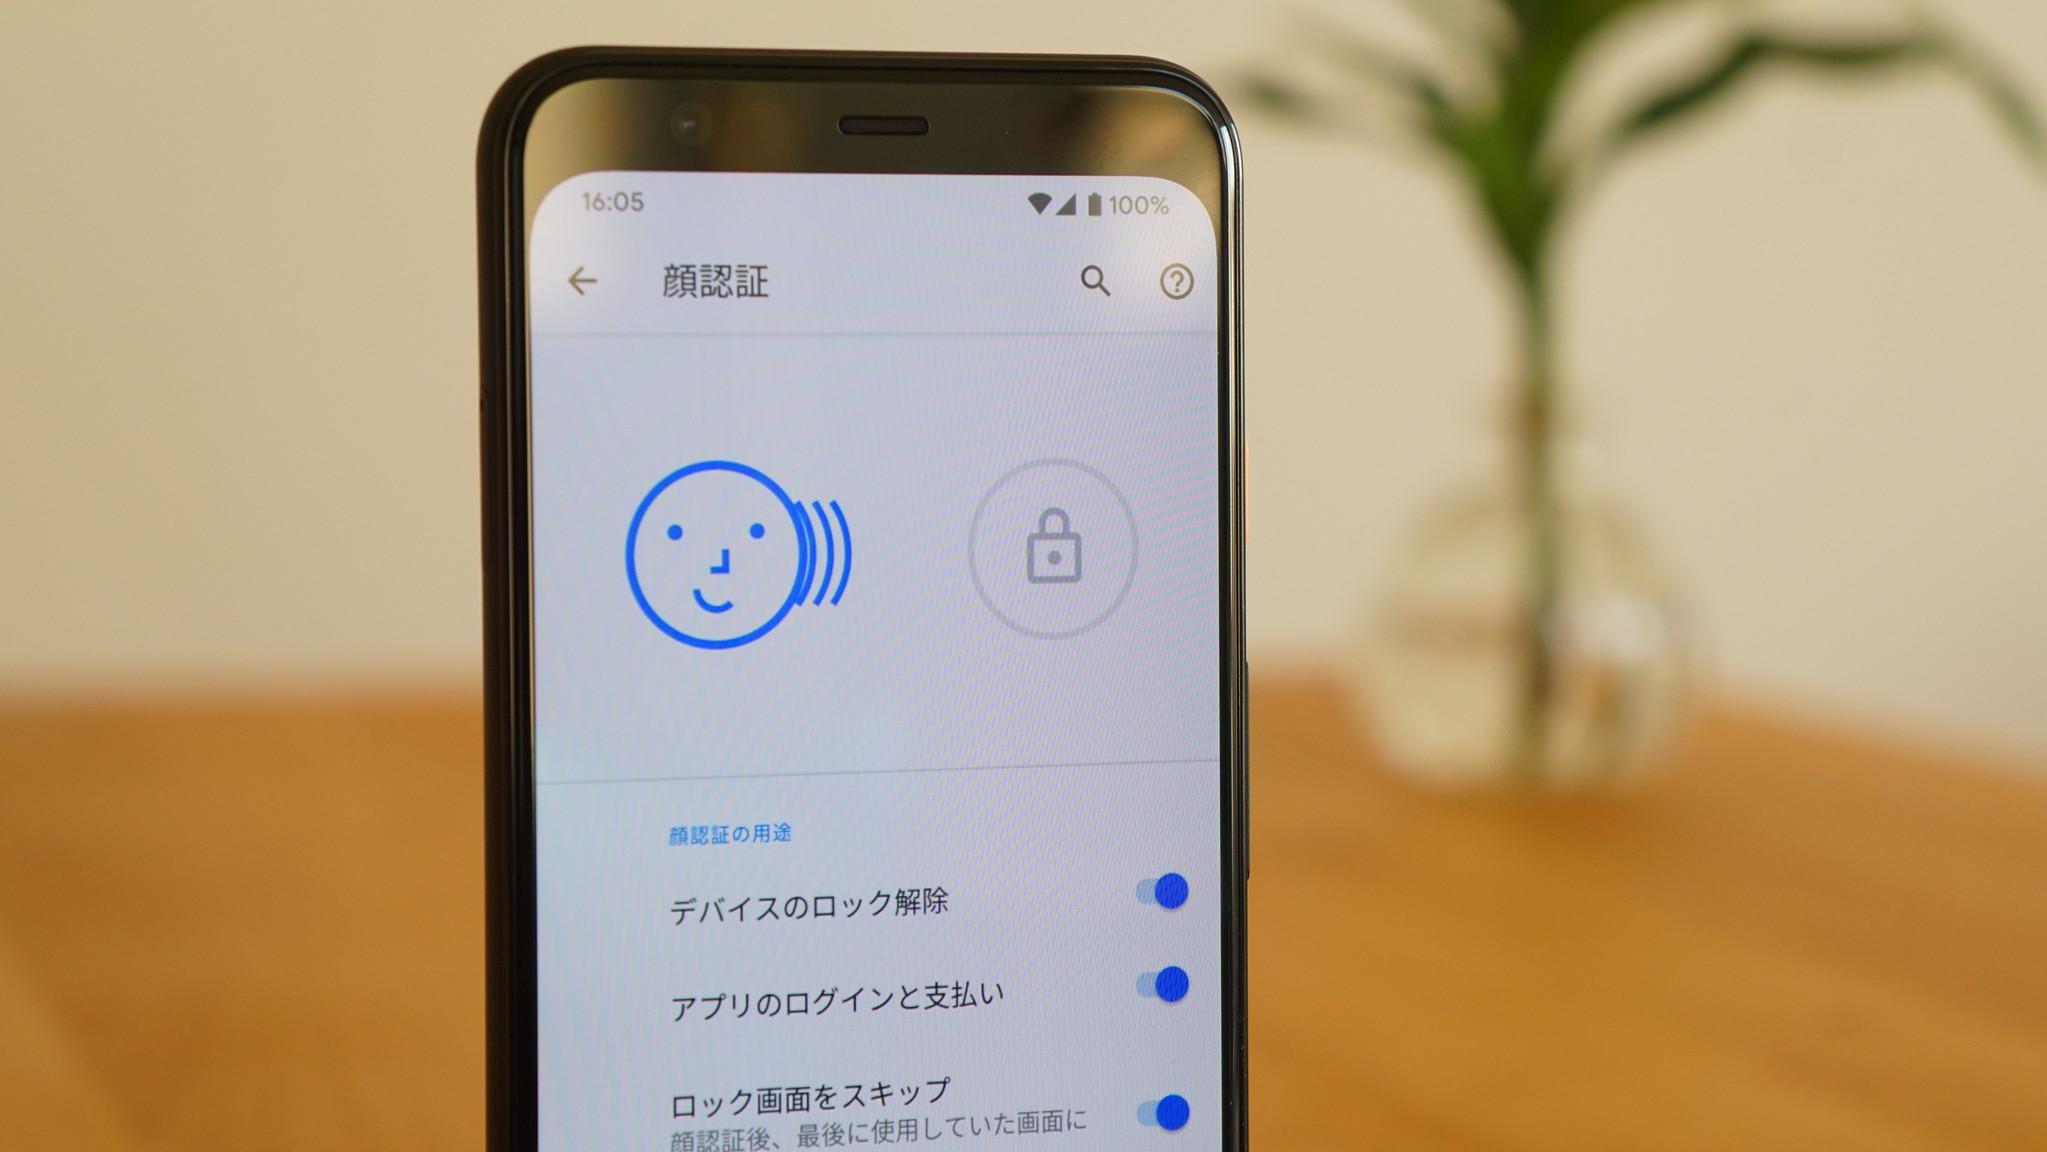 Pixel 4、一部で顔認証が使えなくなる不具合発生。アップデートが原因?